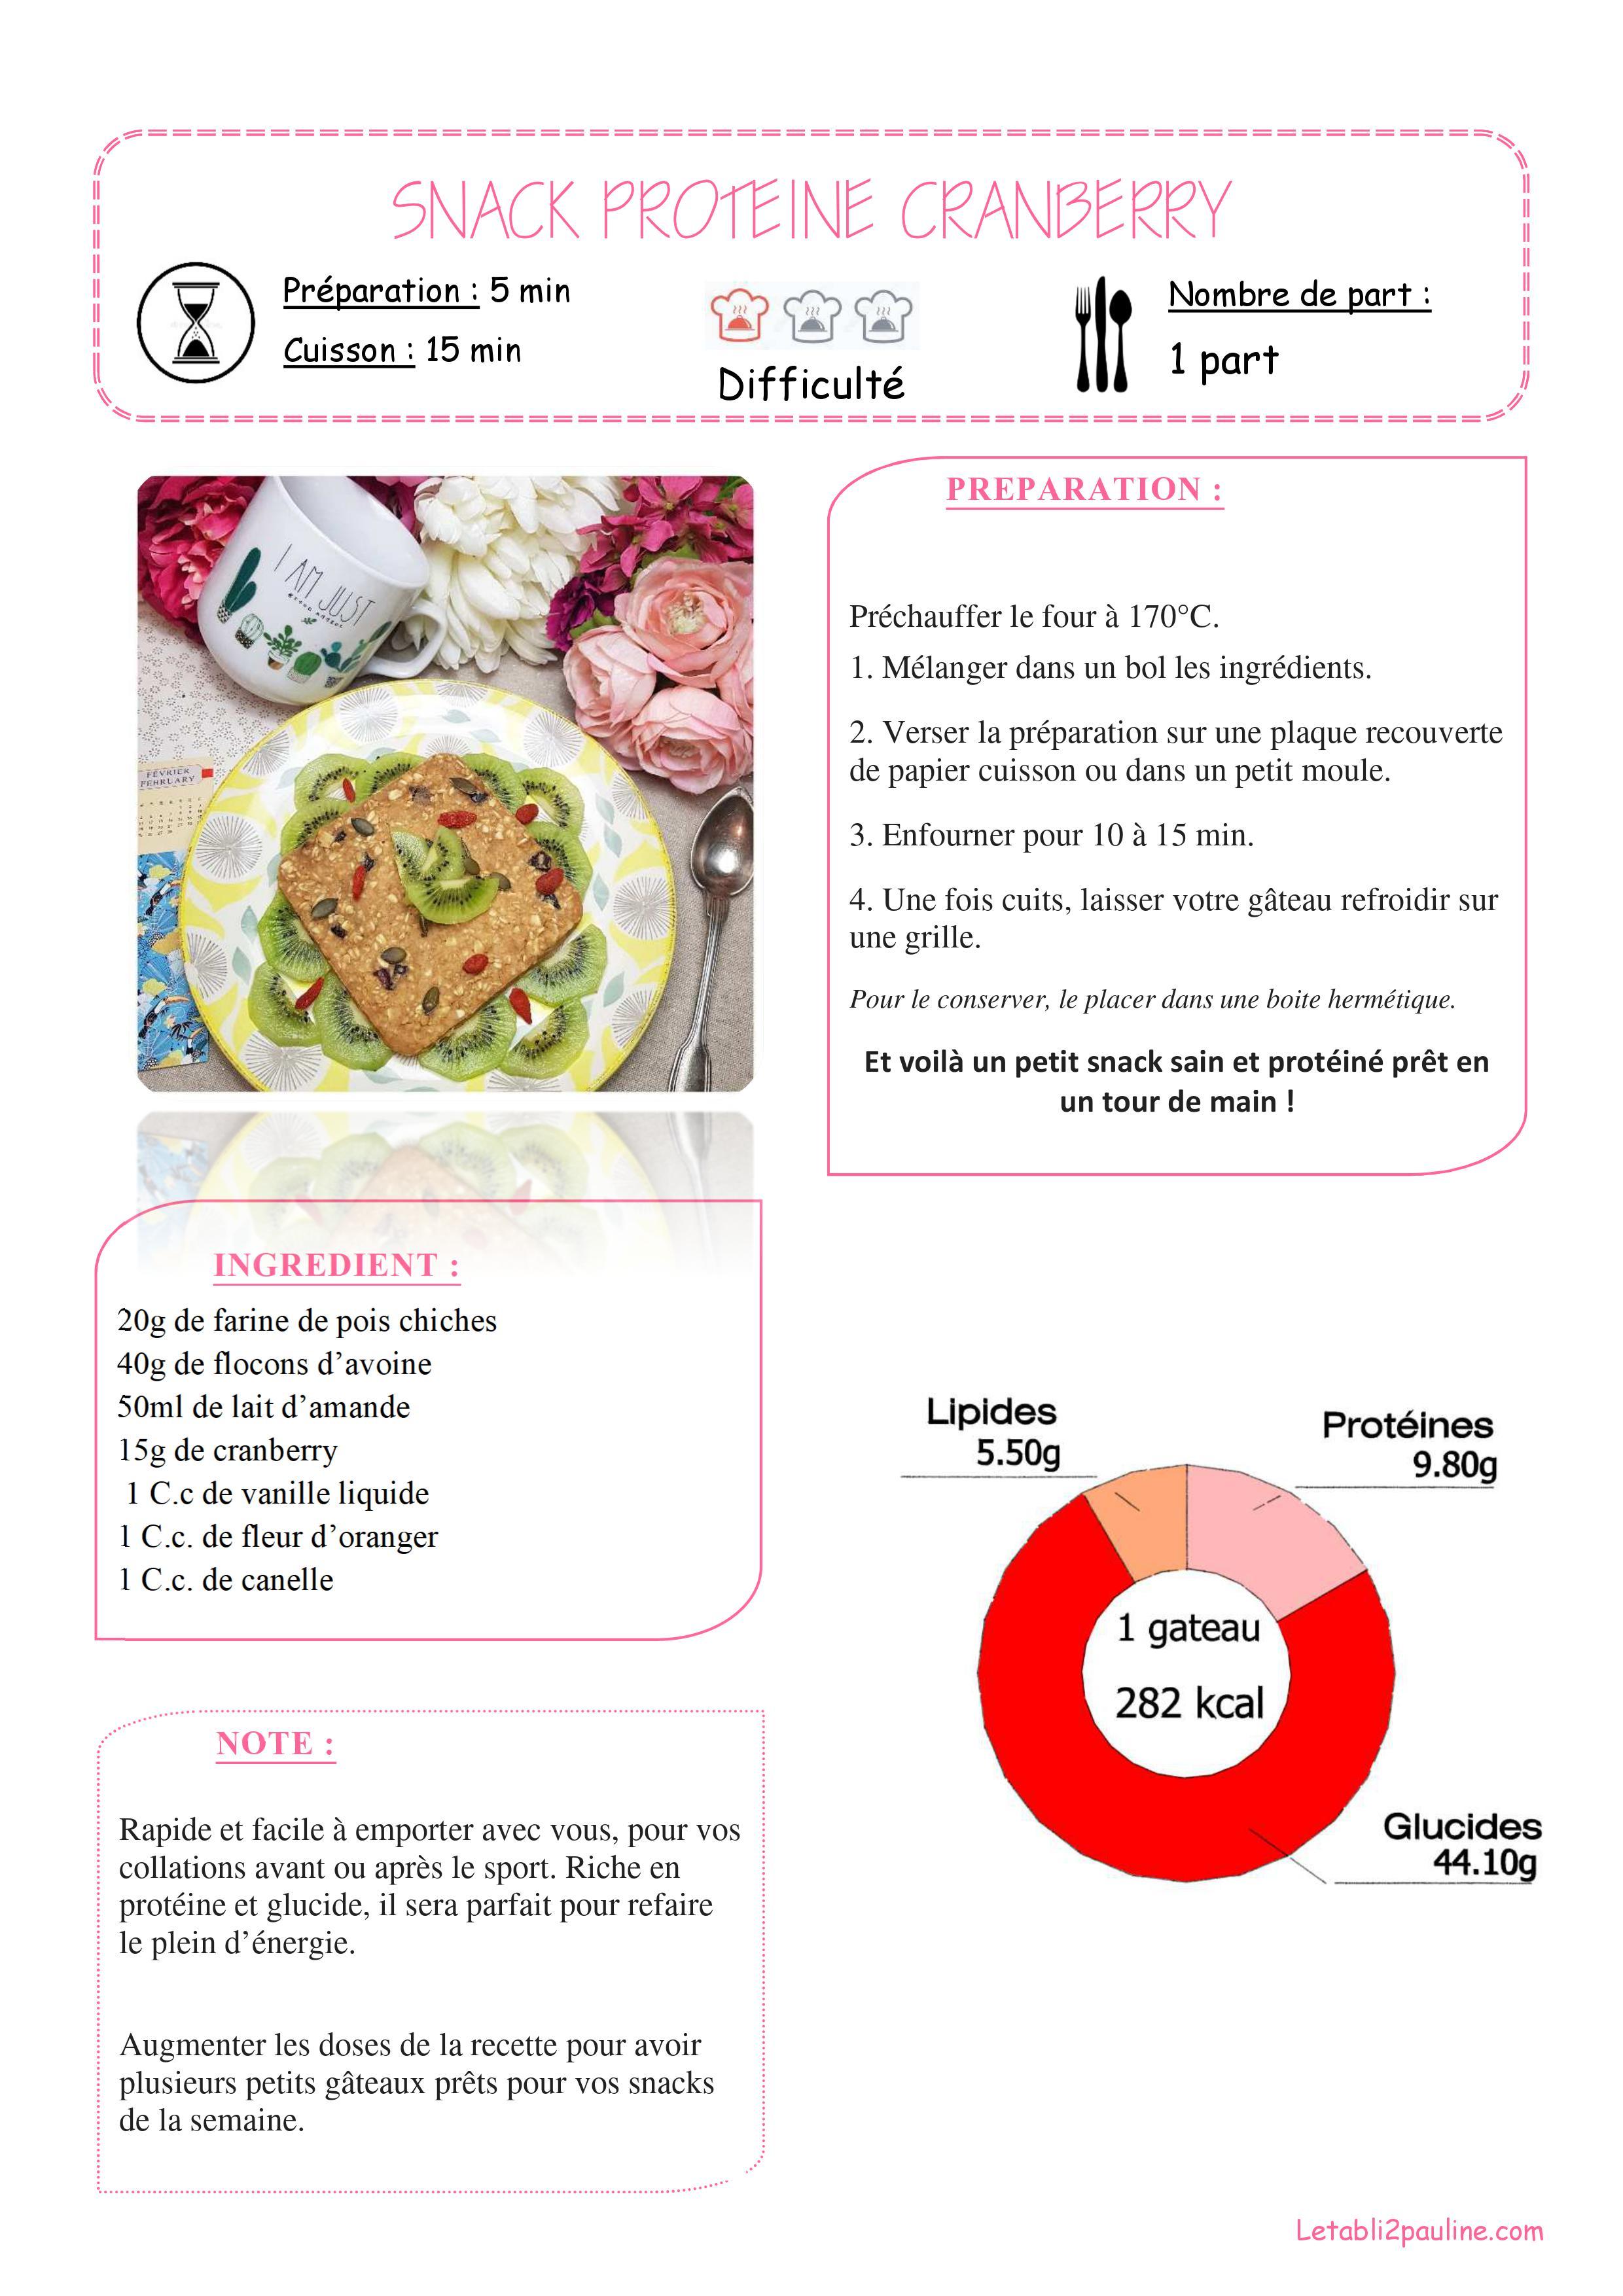 snack protéine cramberry.jpg